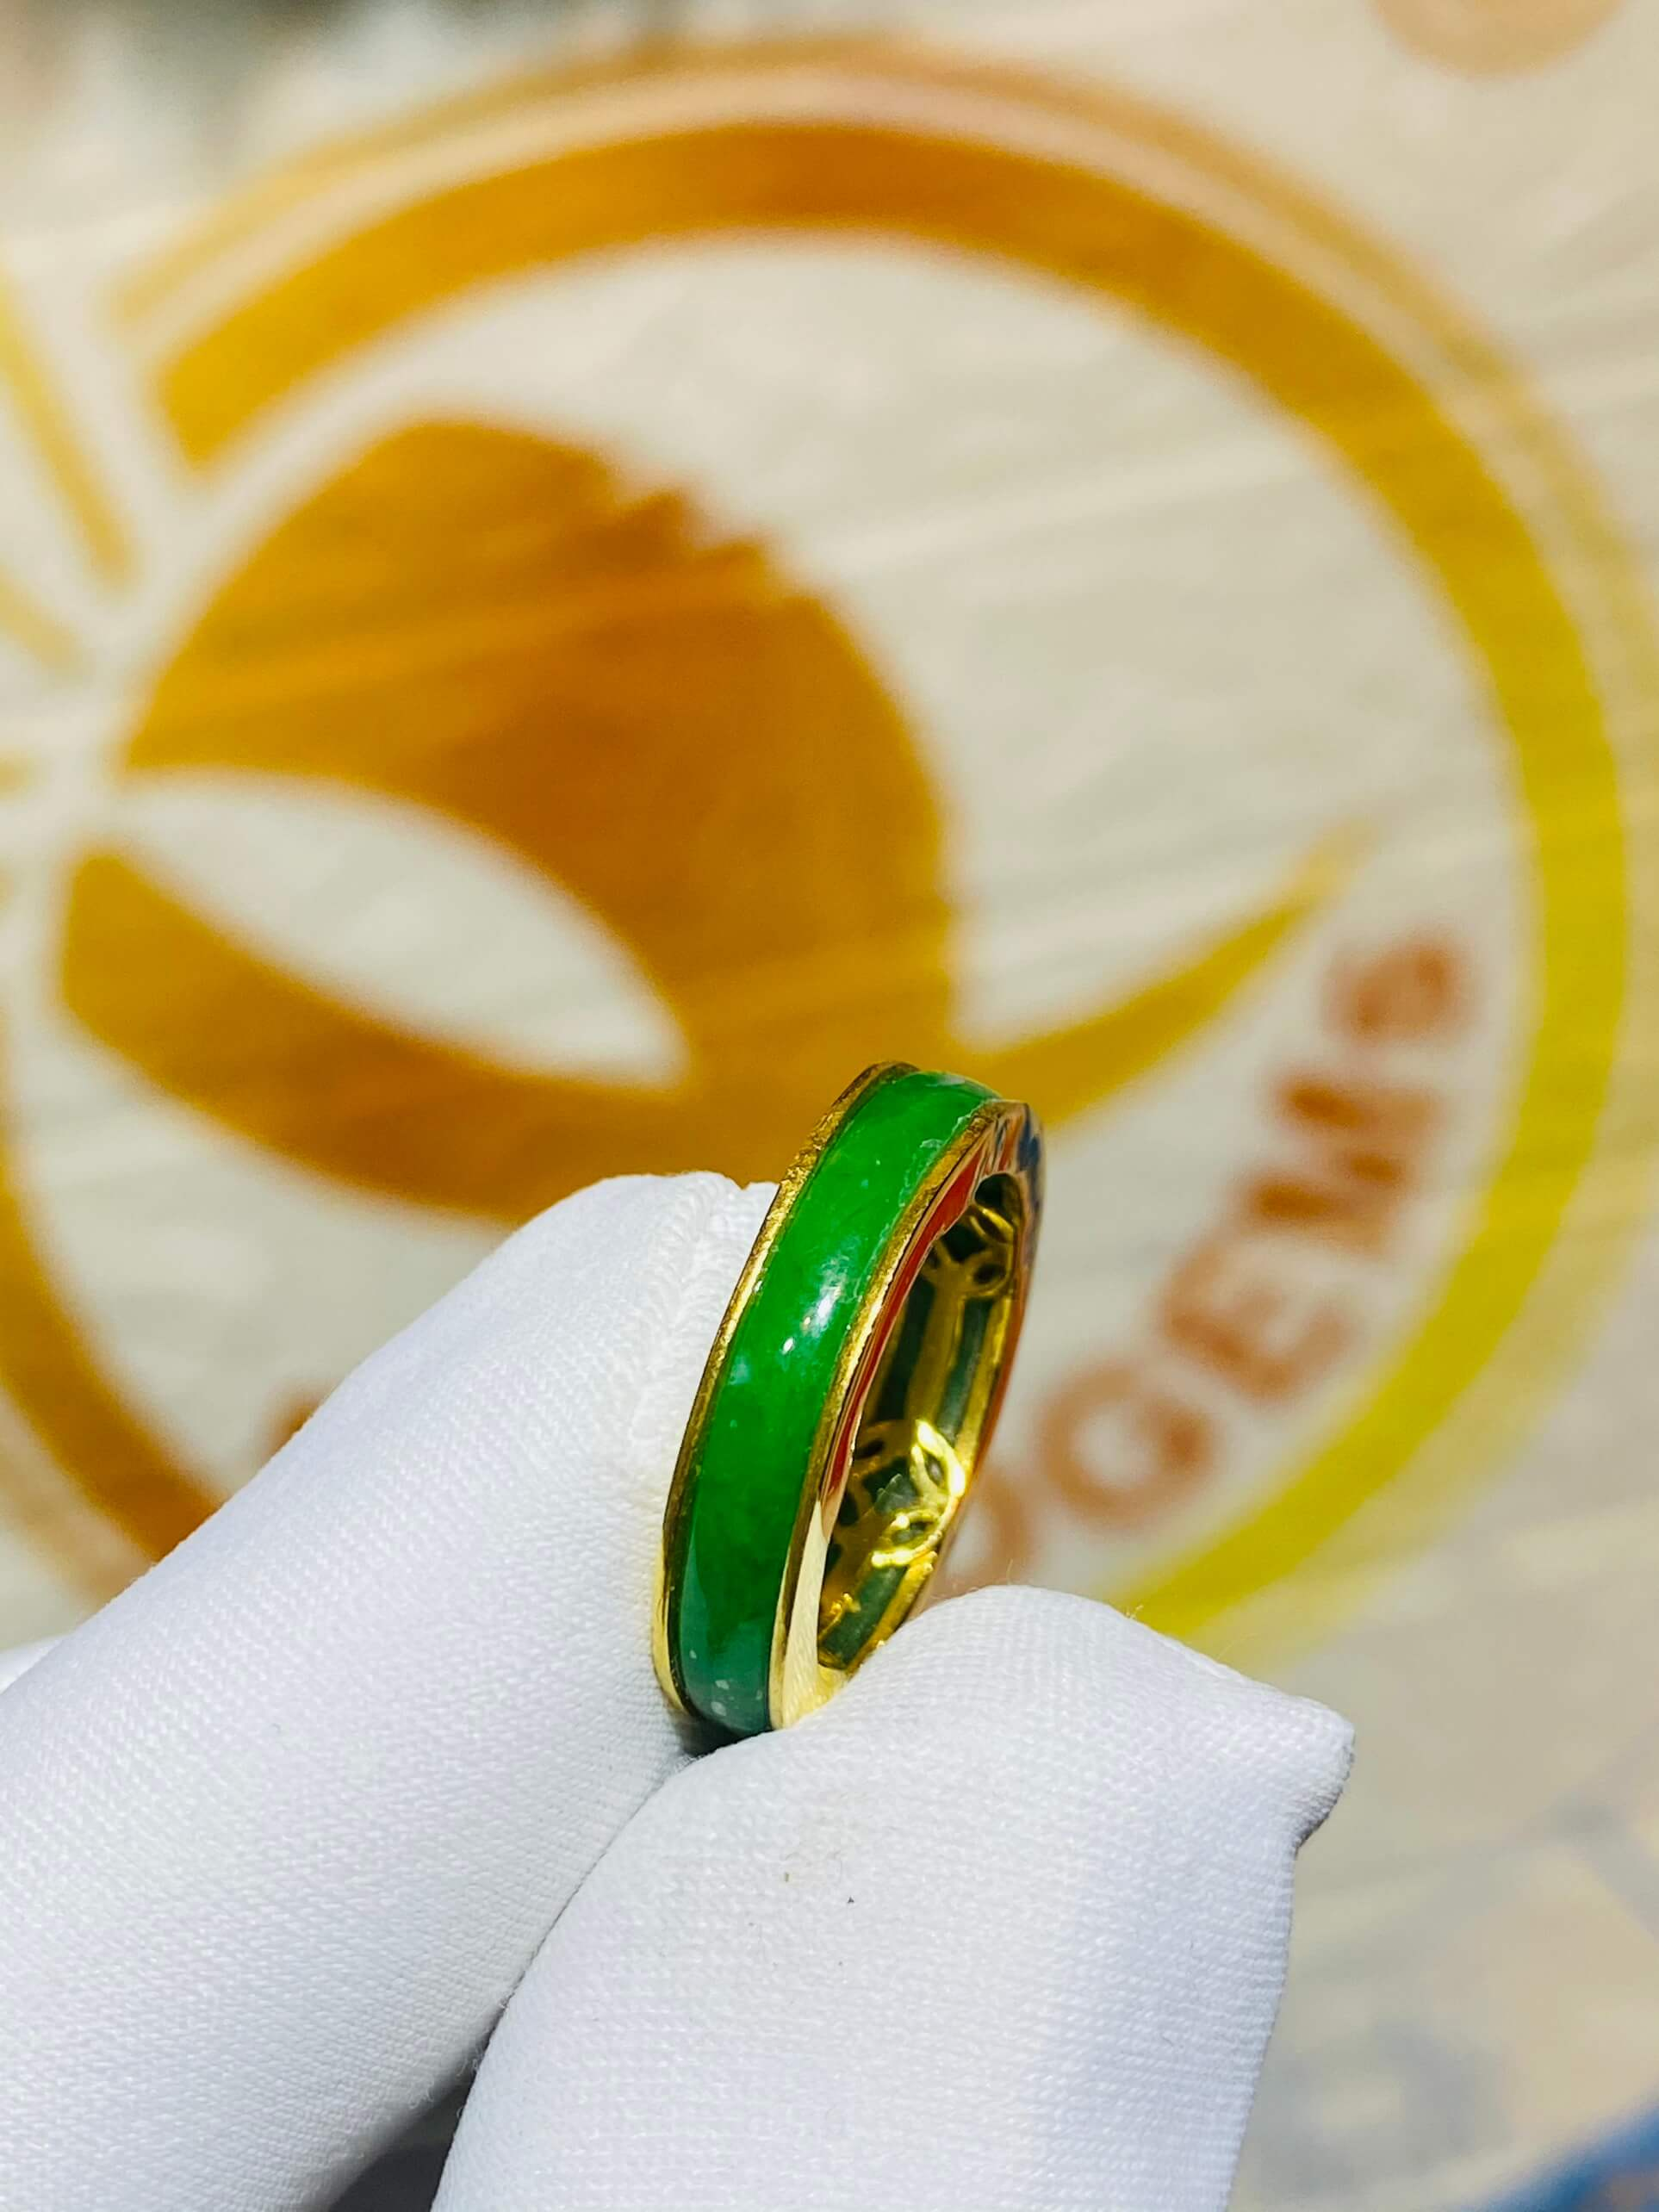 nhan-ngoc-jadeite-boc-5-dong-tien-vang-tai-loc-deo-ngon-ut-Riogems